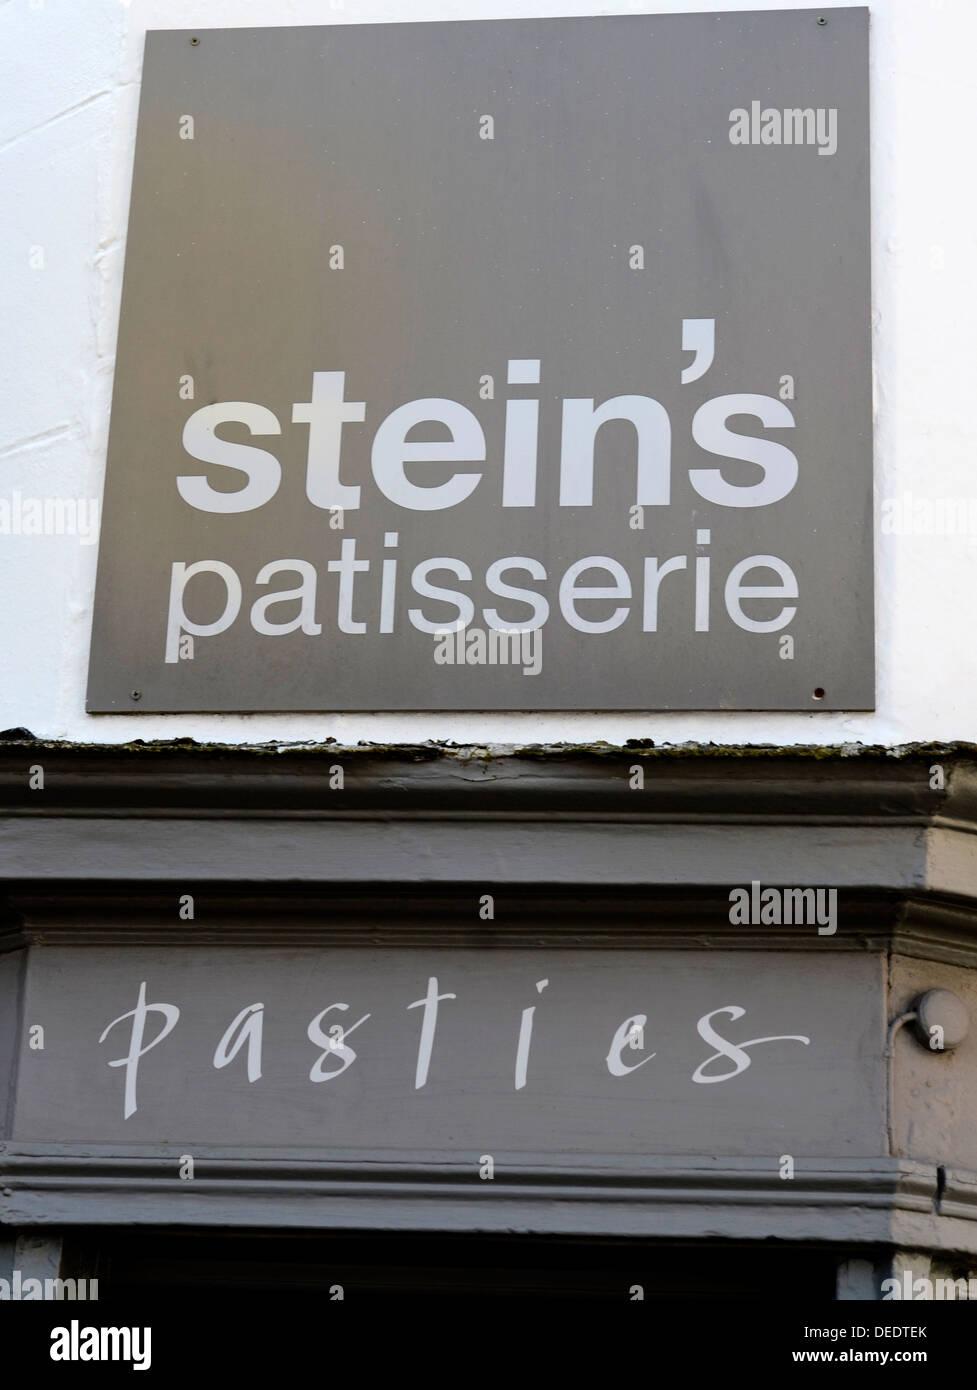 Rick Steins patisserie in Padstow, Cornwall, UK - Stock Image